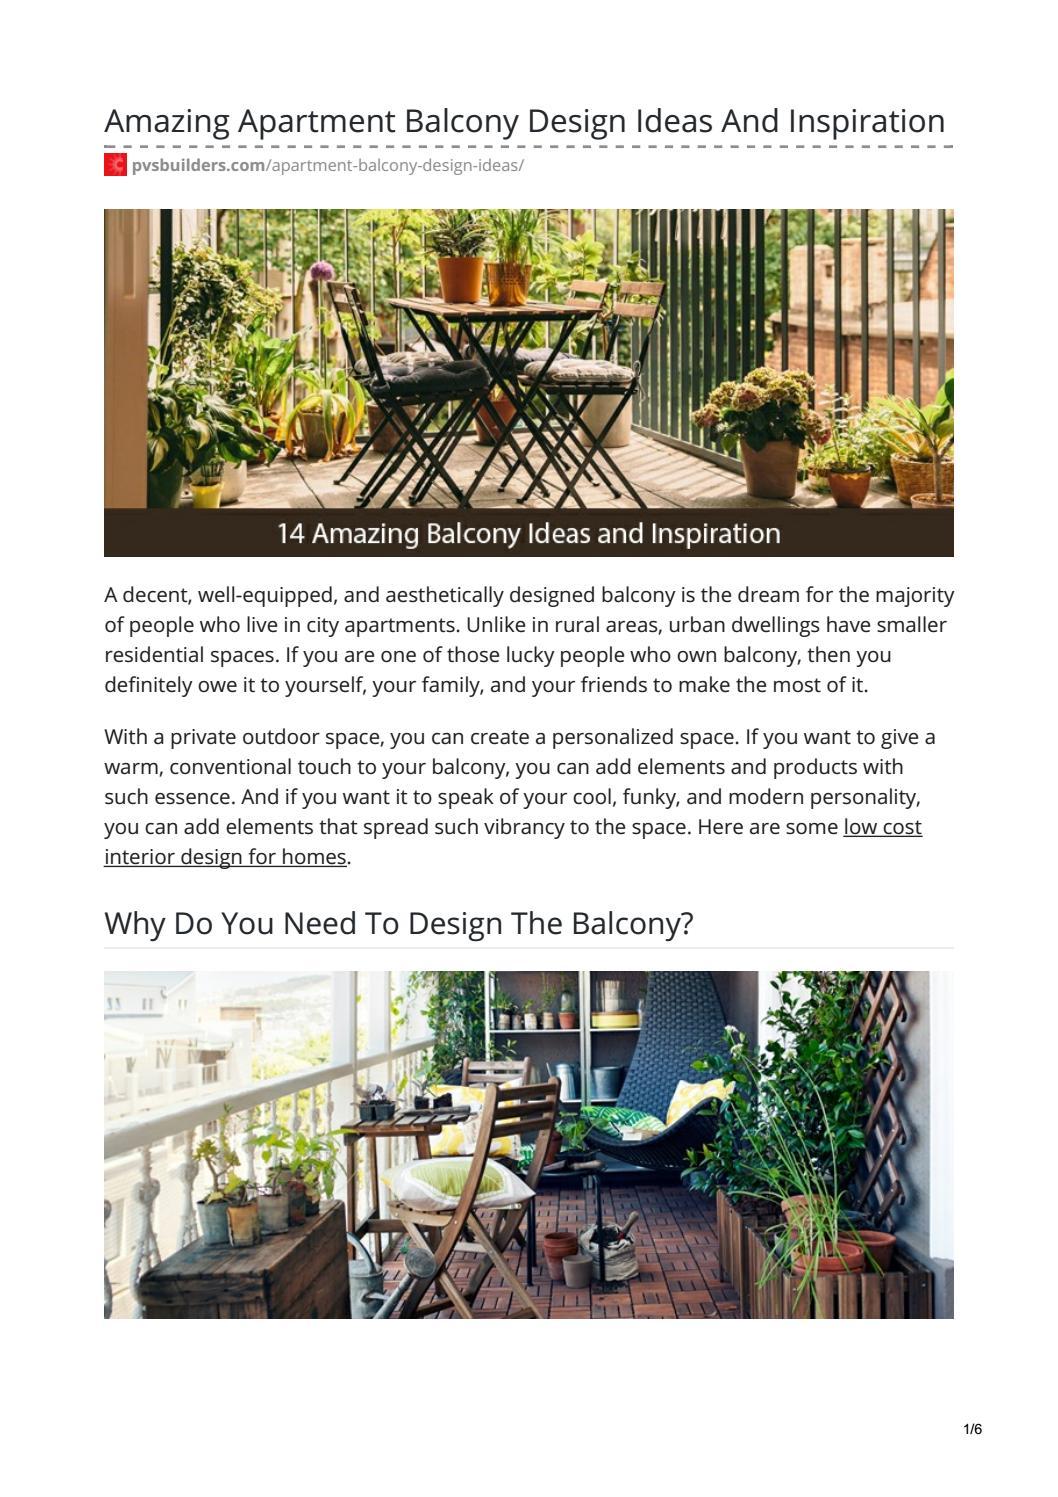 Amazing Apartment Balcony Design Ideas